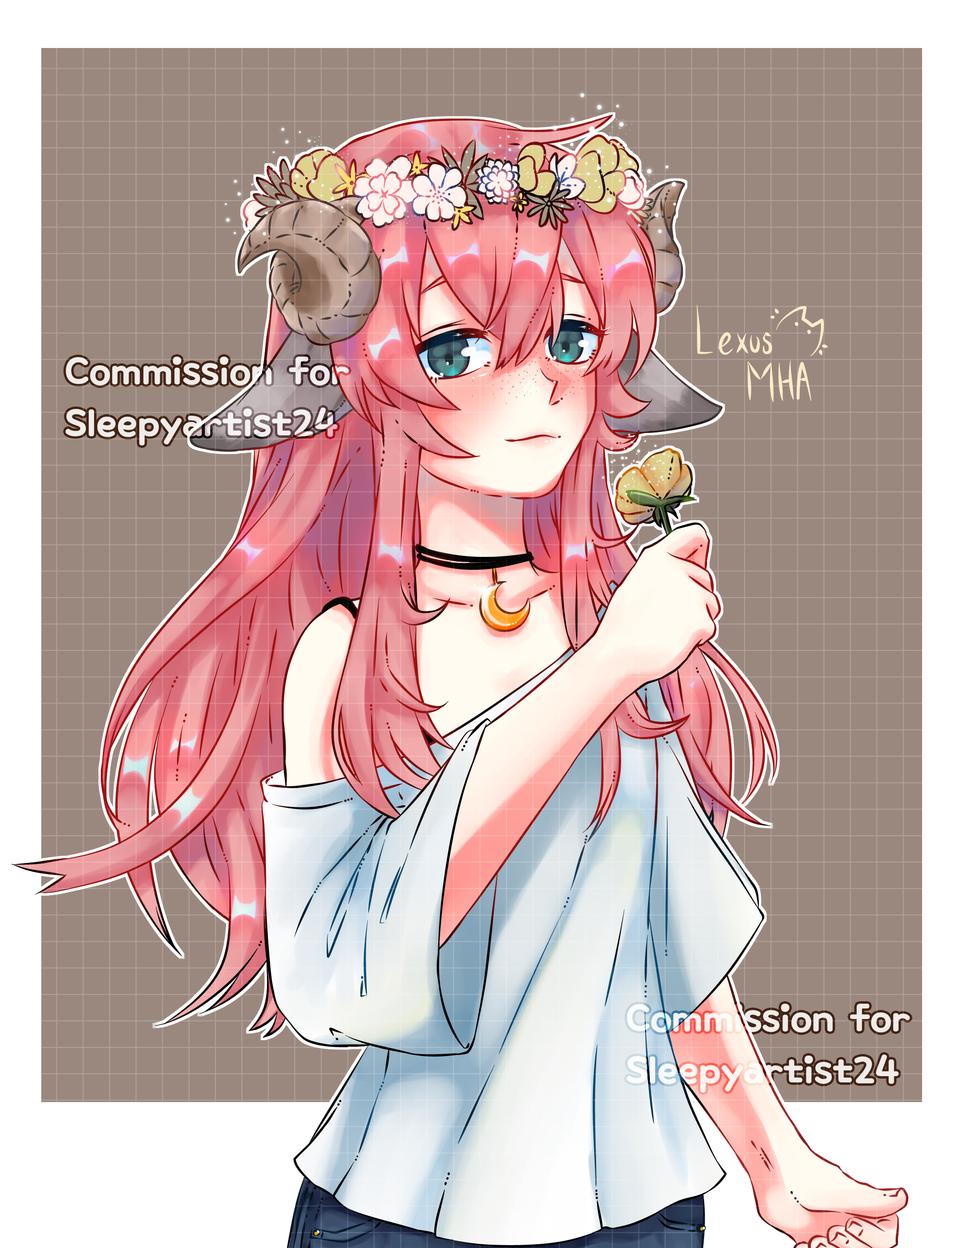 Commission for 》@sleepyartist24 (IG)  Illust of Lex medibangpaint oc pink flowers horns comisión commission